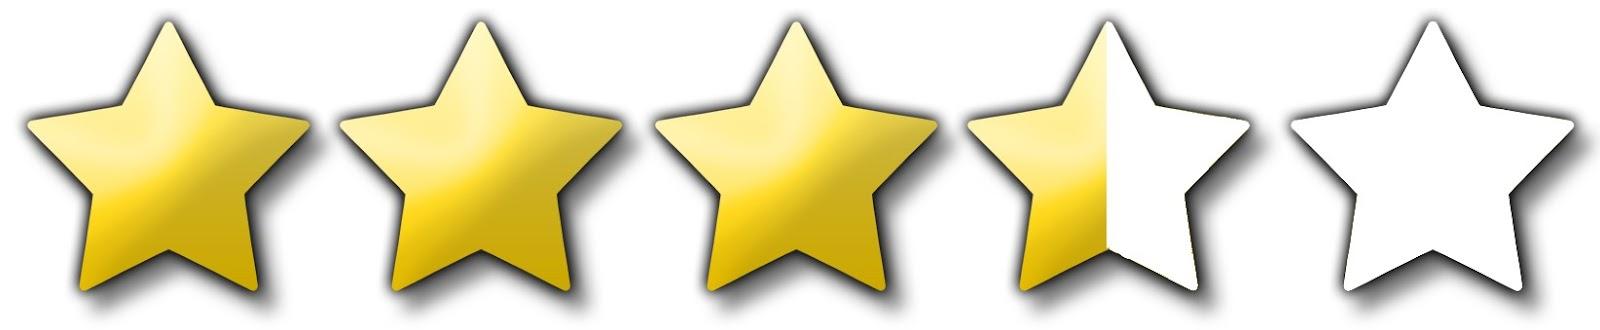 3.5/5 STARS